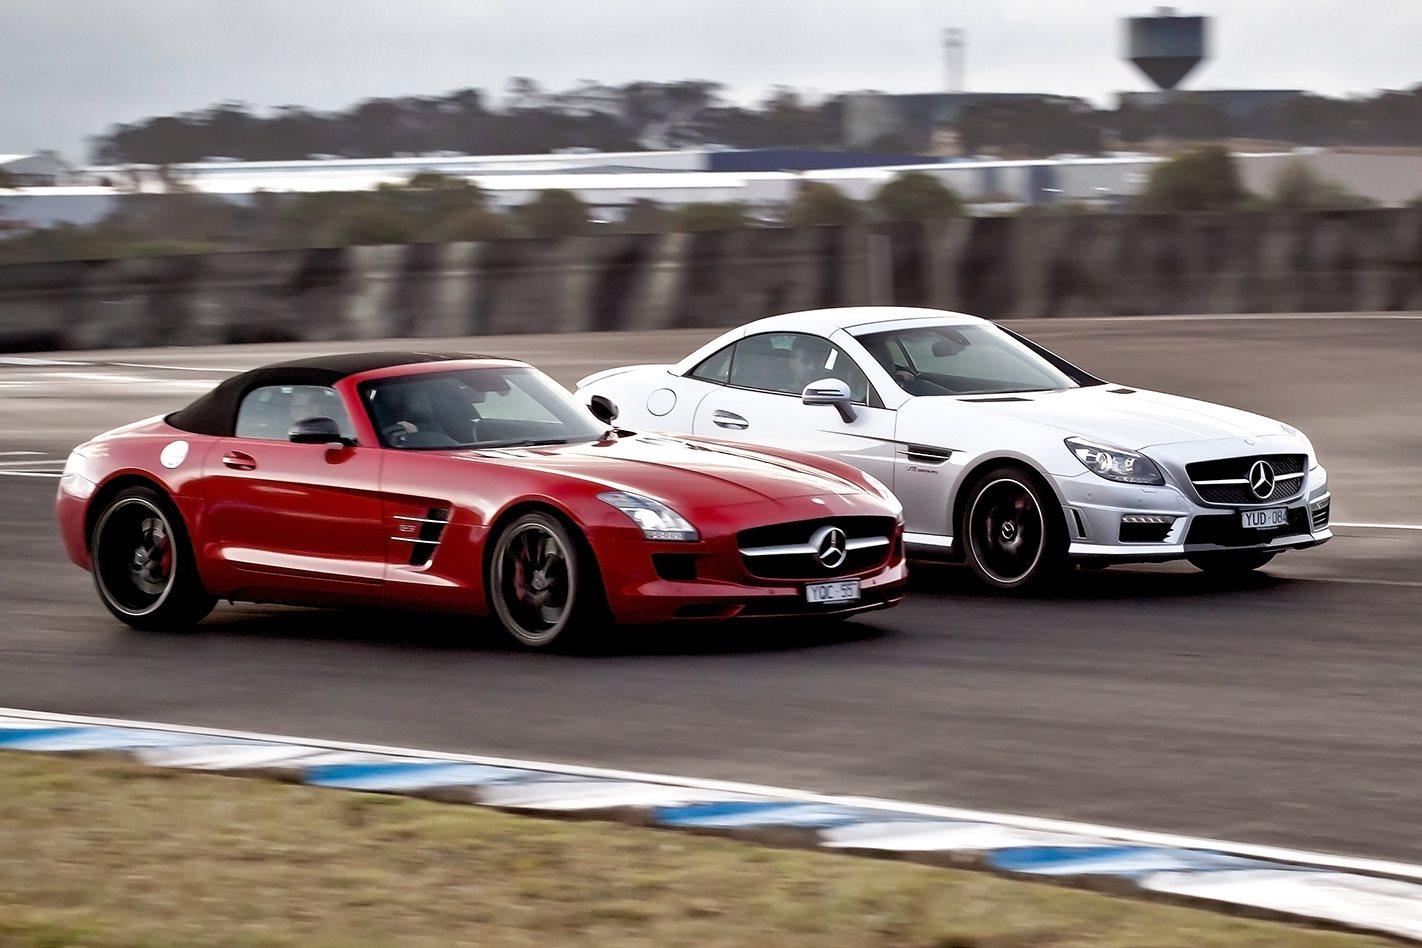 Mercedes-Benz-SLK-55-AMG-&-Mercedes-Benz-SLS-AMG.jpg